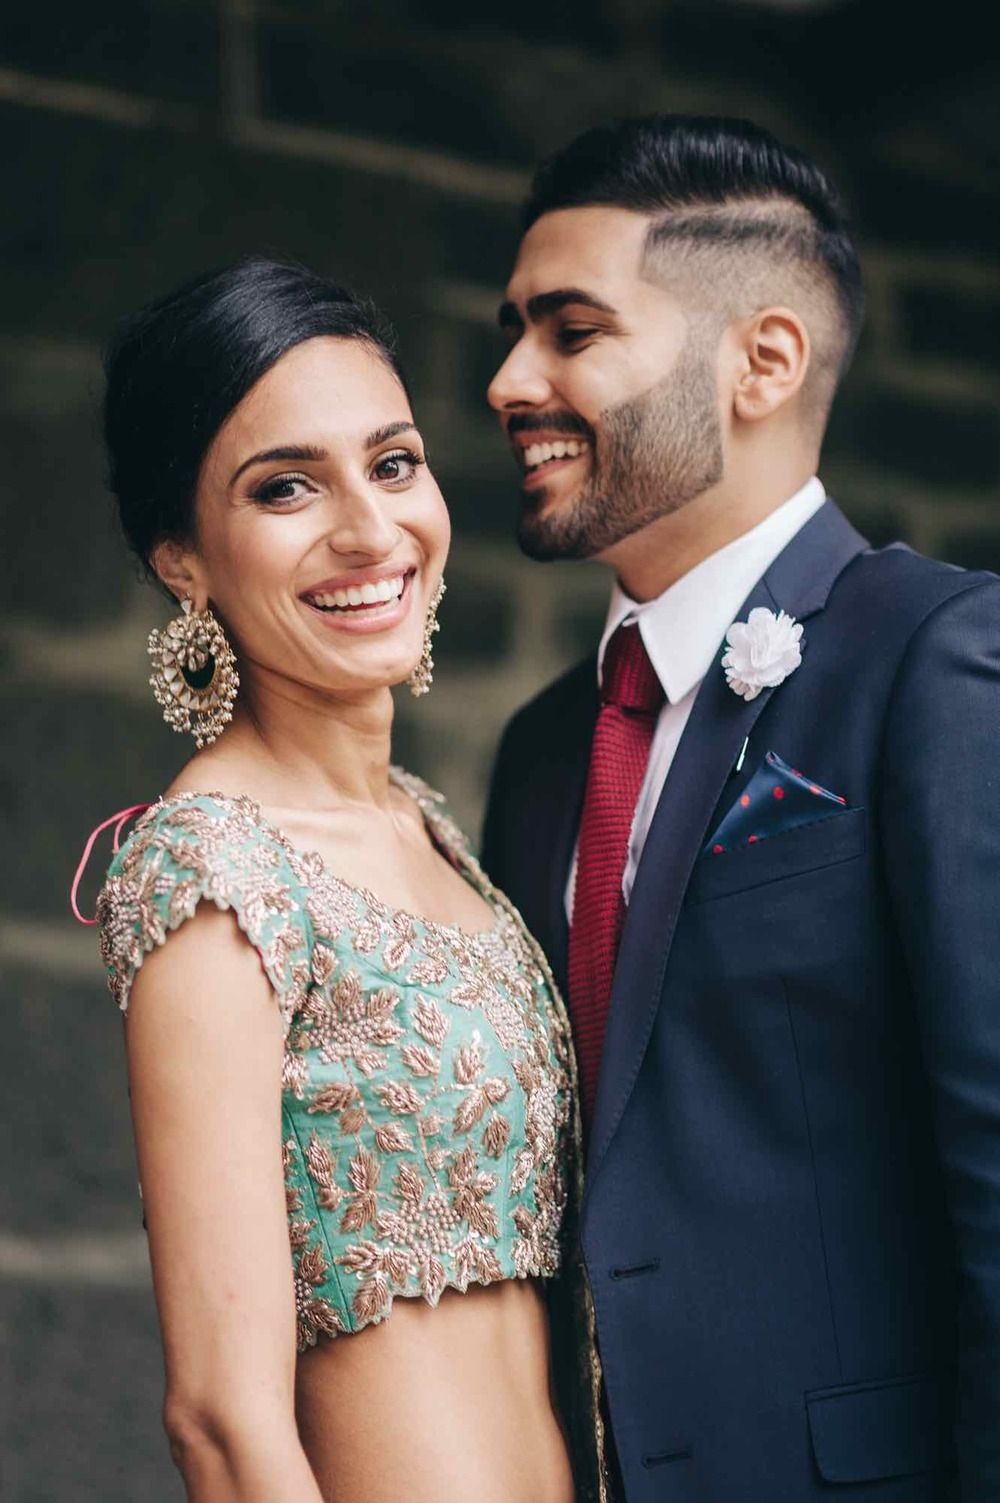 Vintage Fairytale Indian Engagement in Melbourne | wedding couple